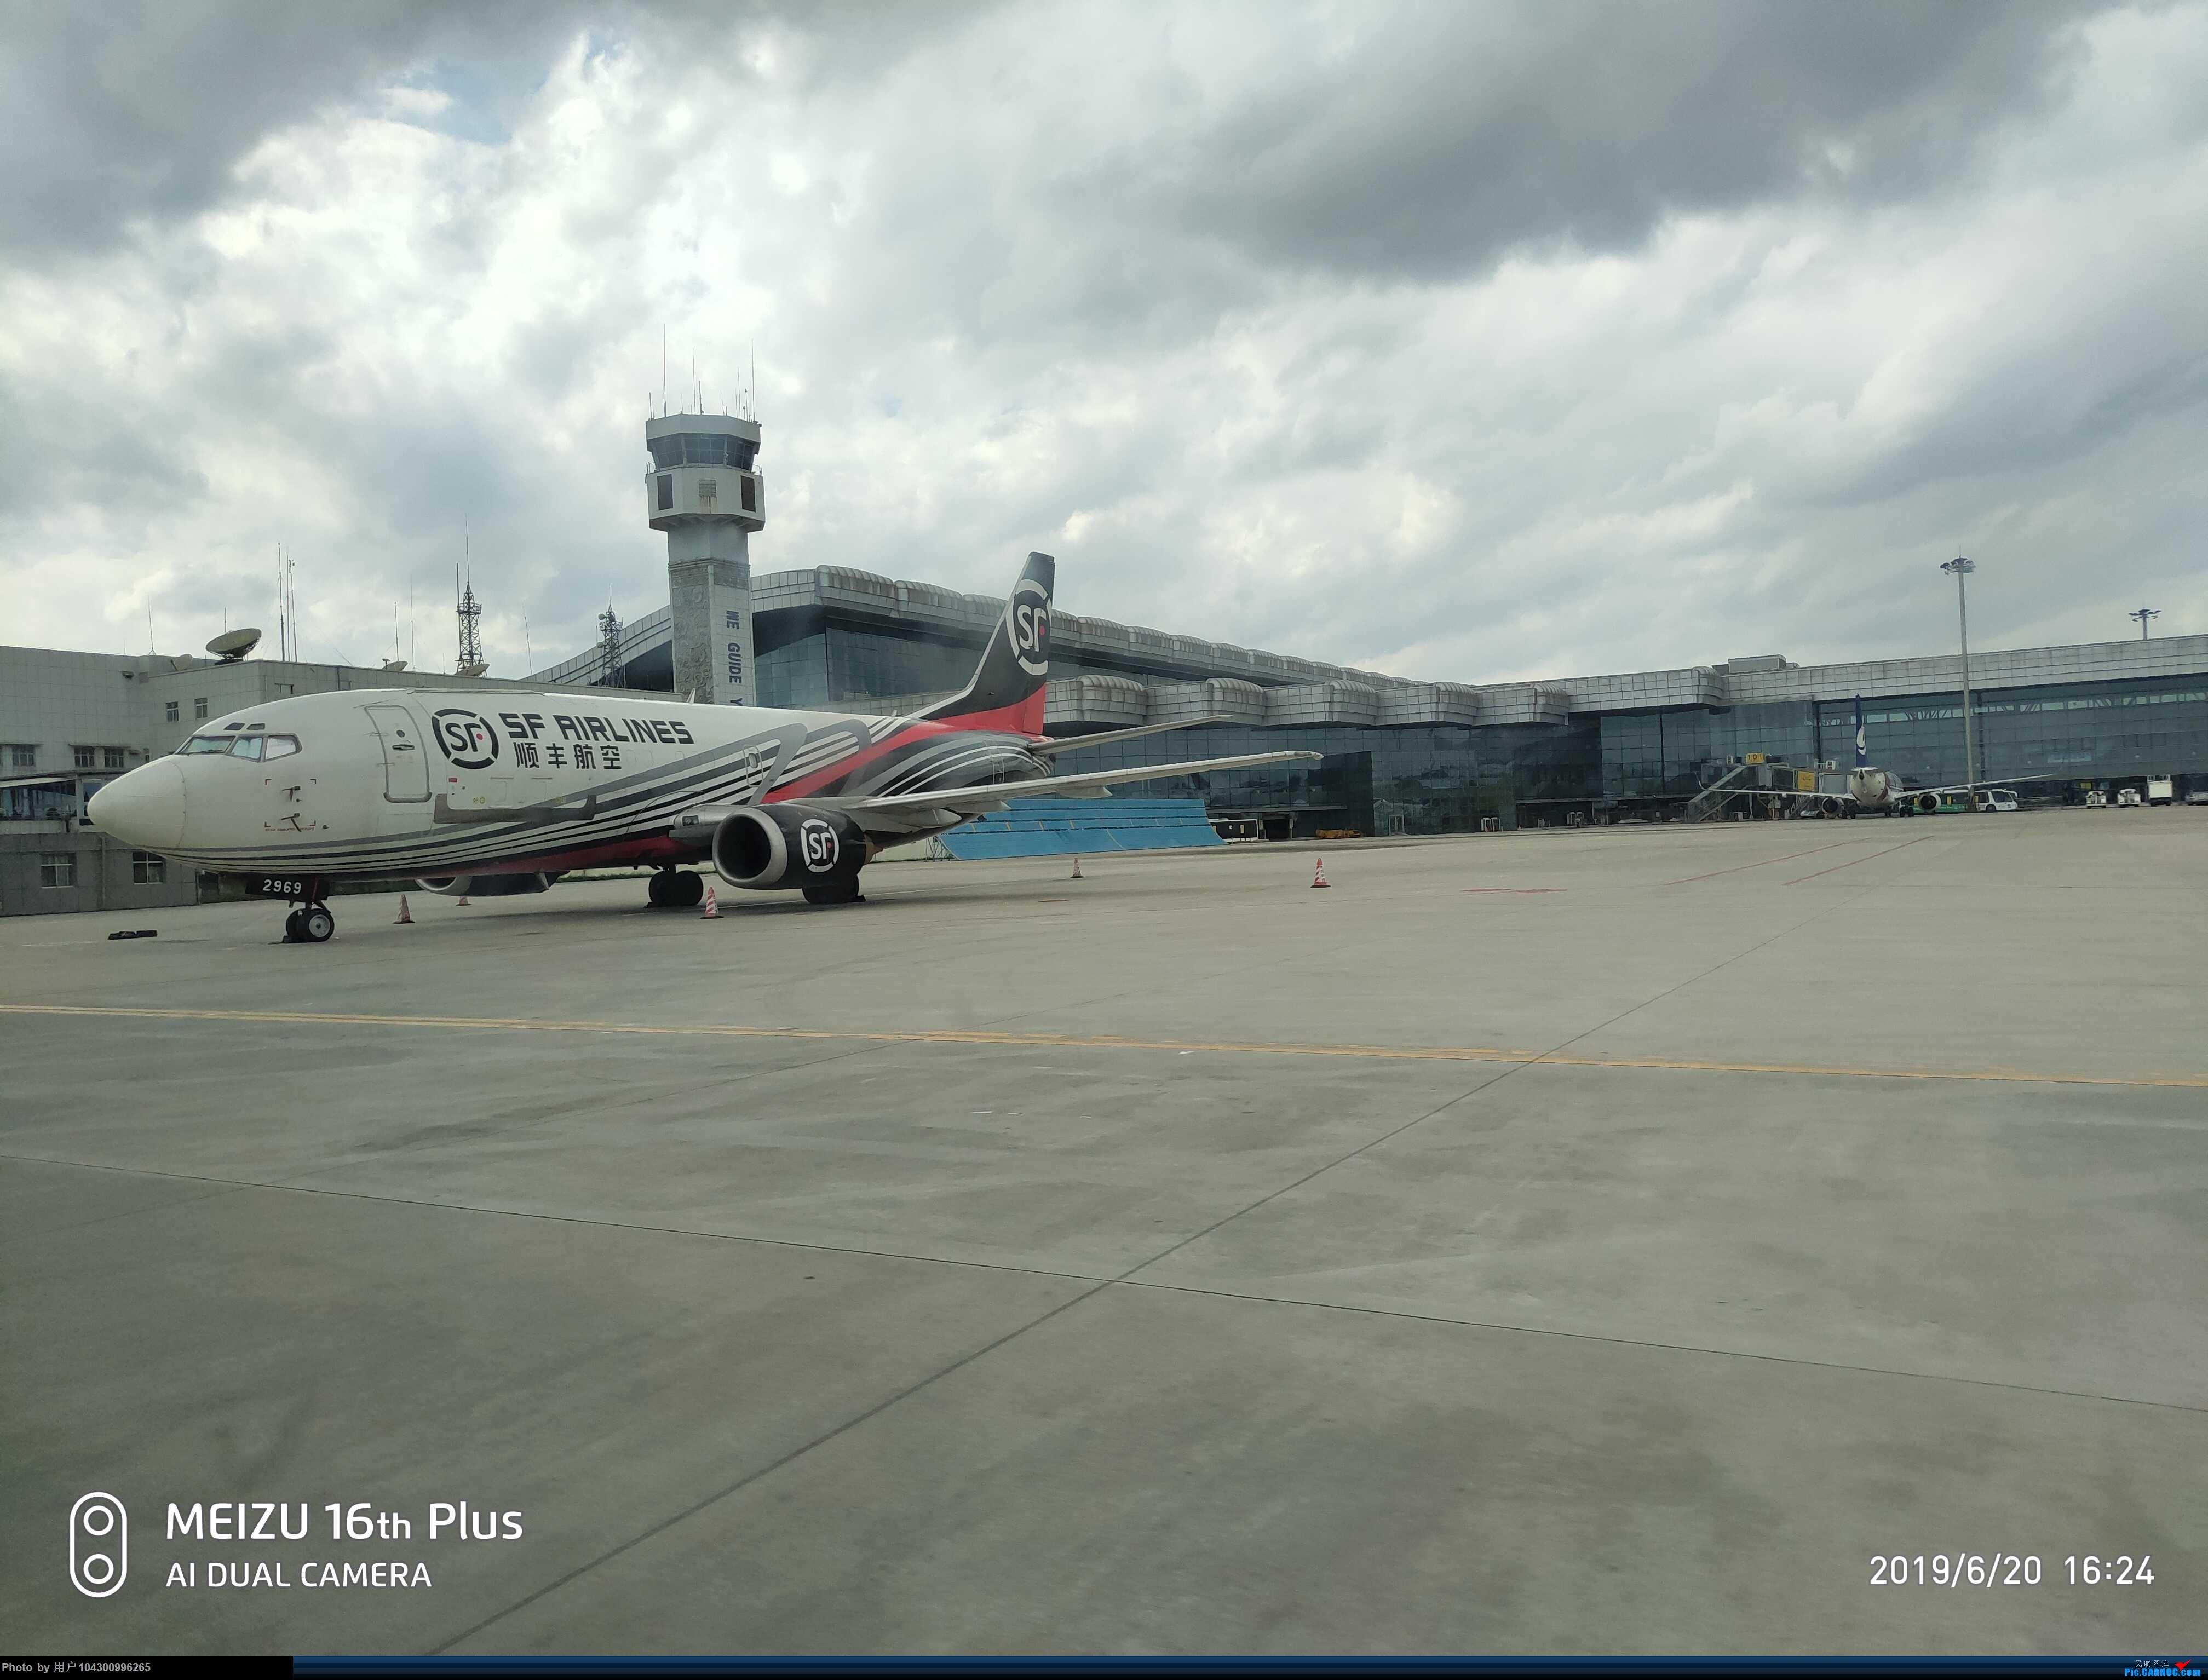 Re:[原创]DM哥飞行游记--贵阳往返荔波2日游 BOEING 737-300 B-2969 中国贵阳龙洞堡国际机场